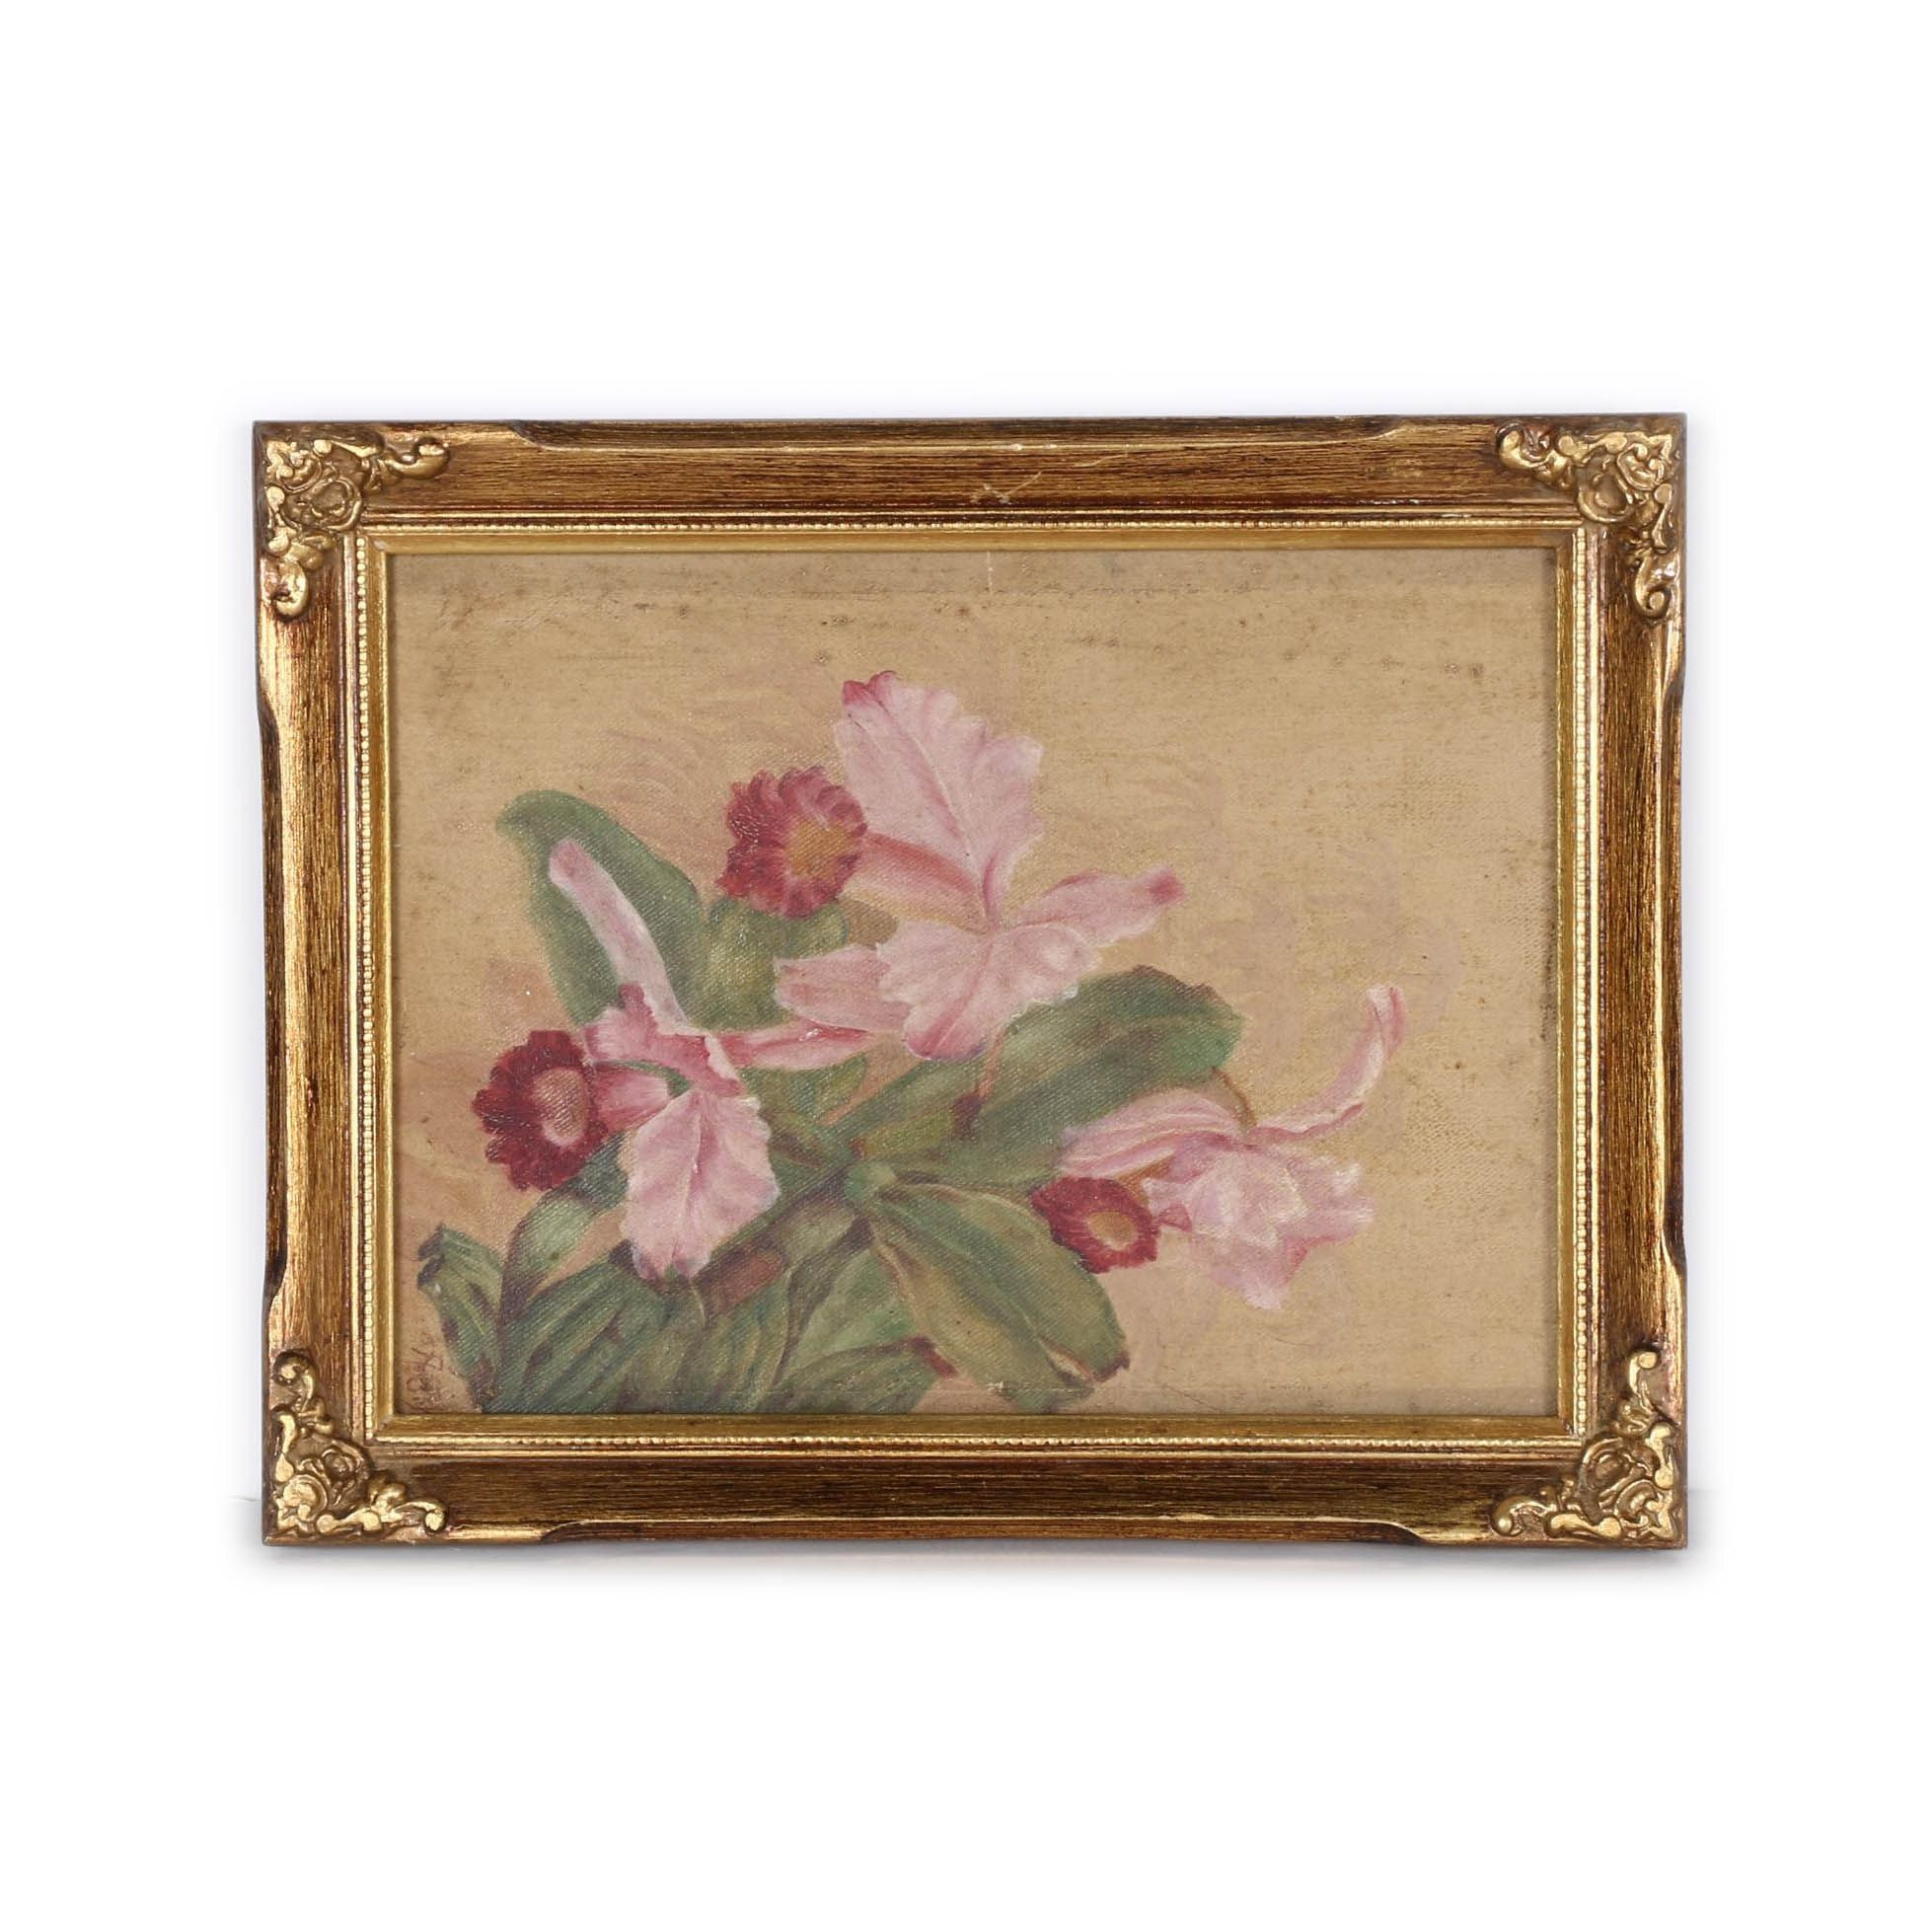 Framed Original Oil Painting of a Flower